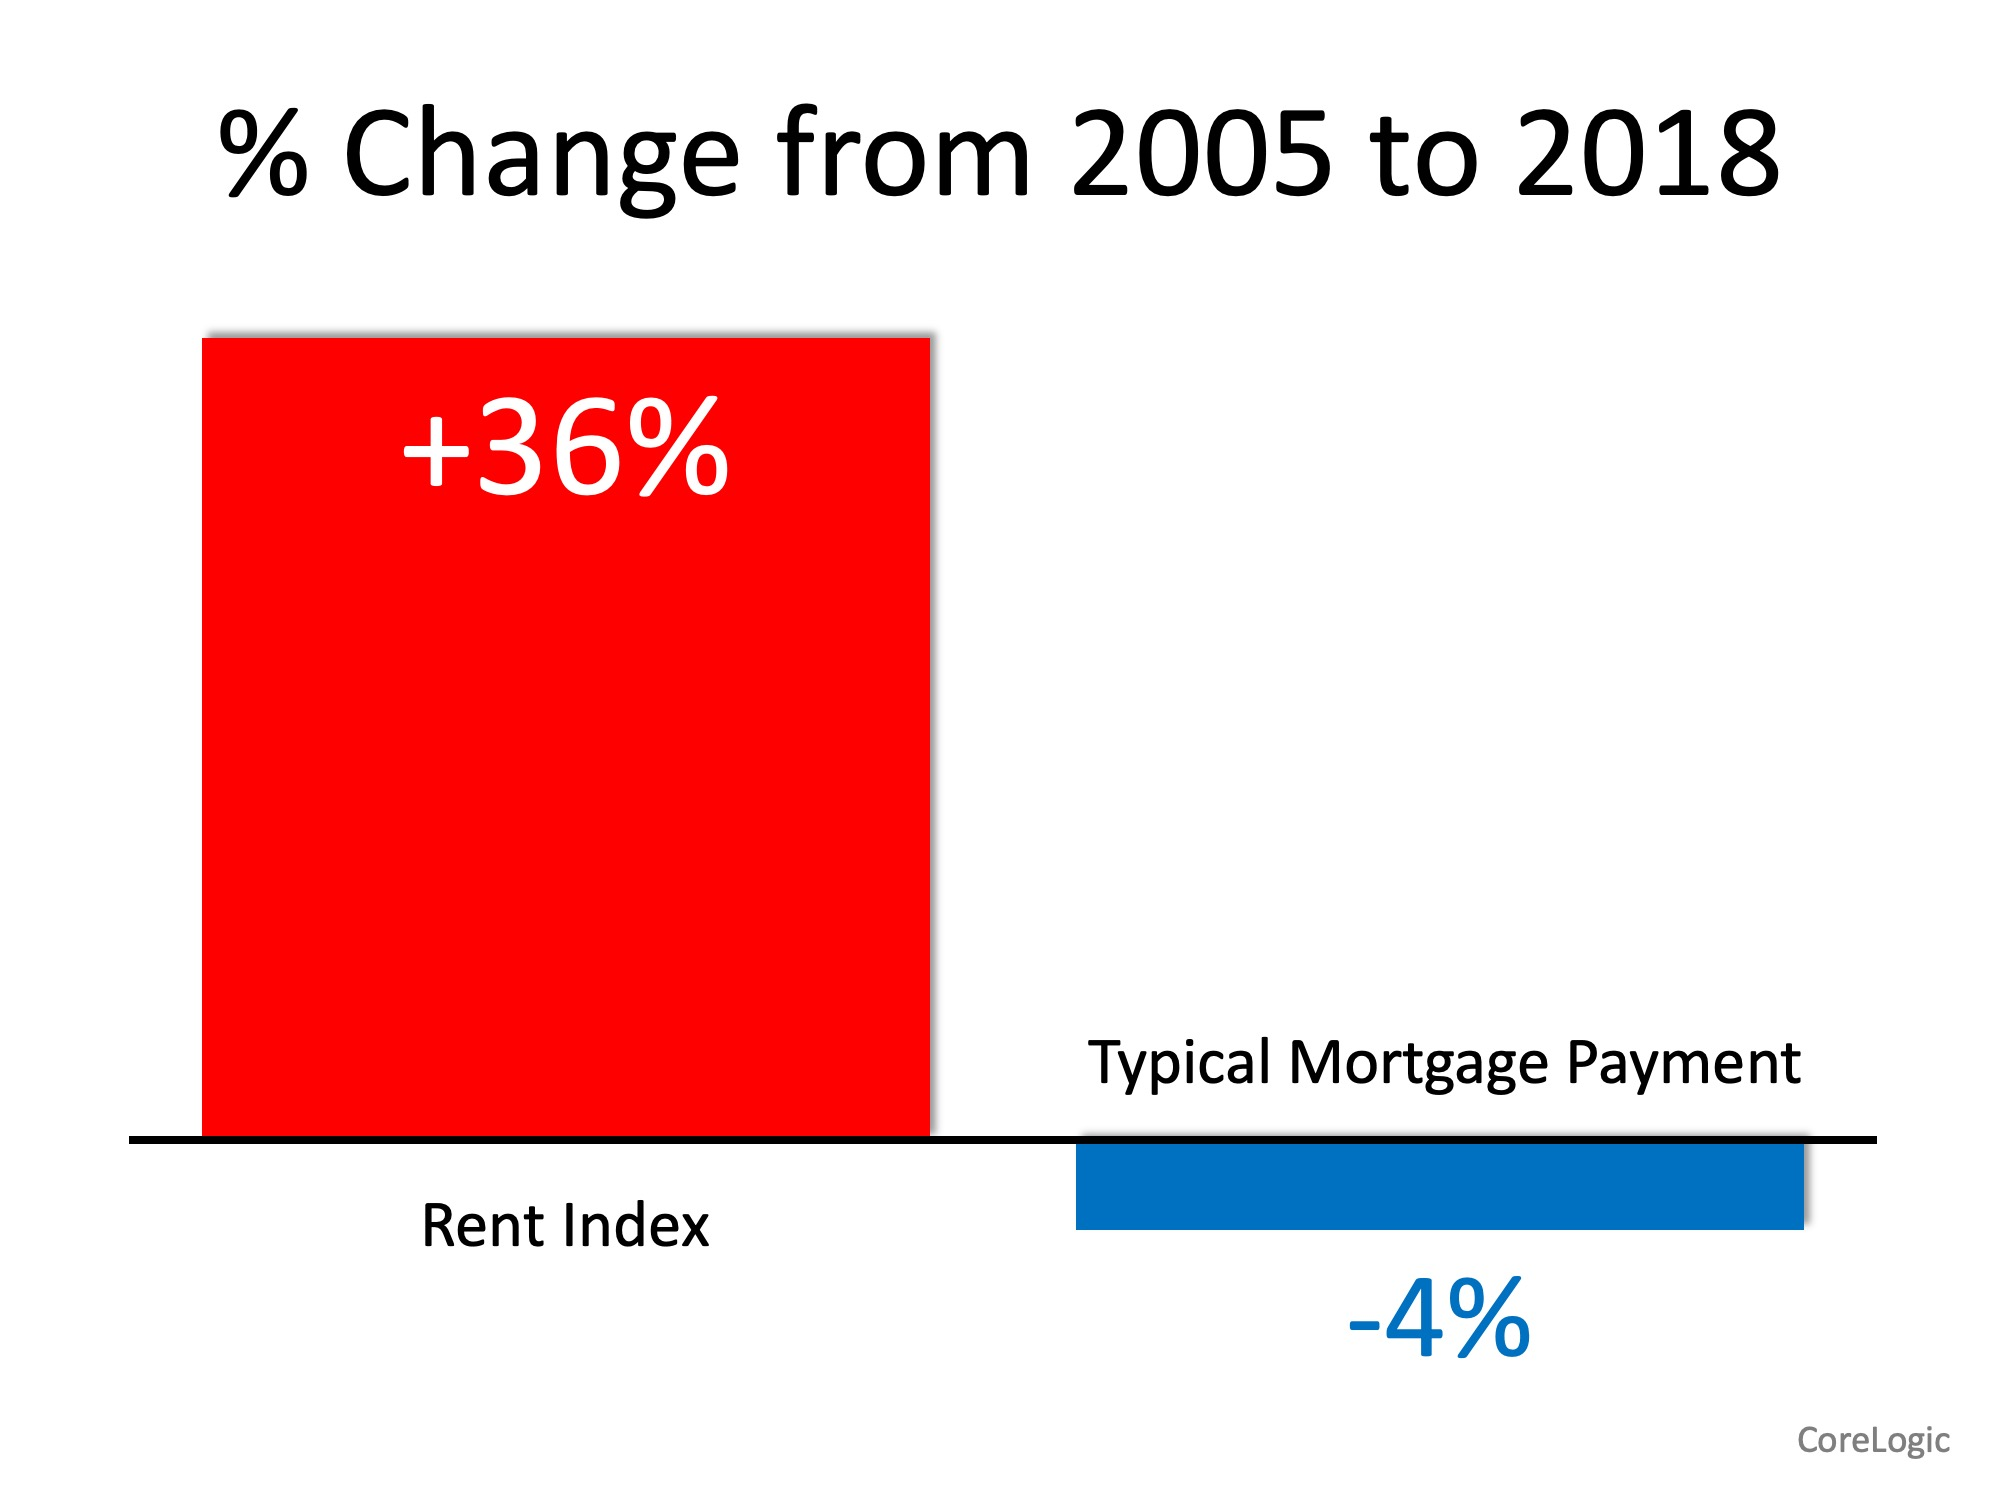 Renting Percentage Change 2005 to 2018